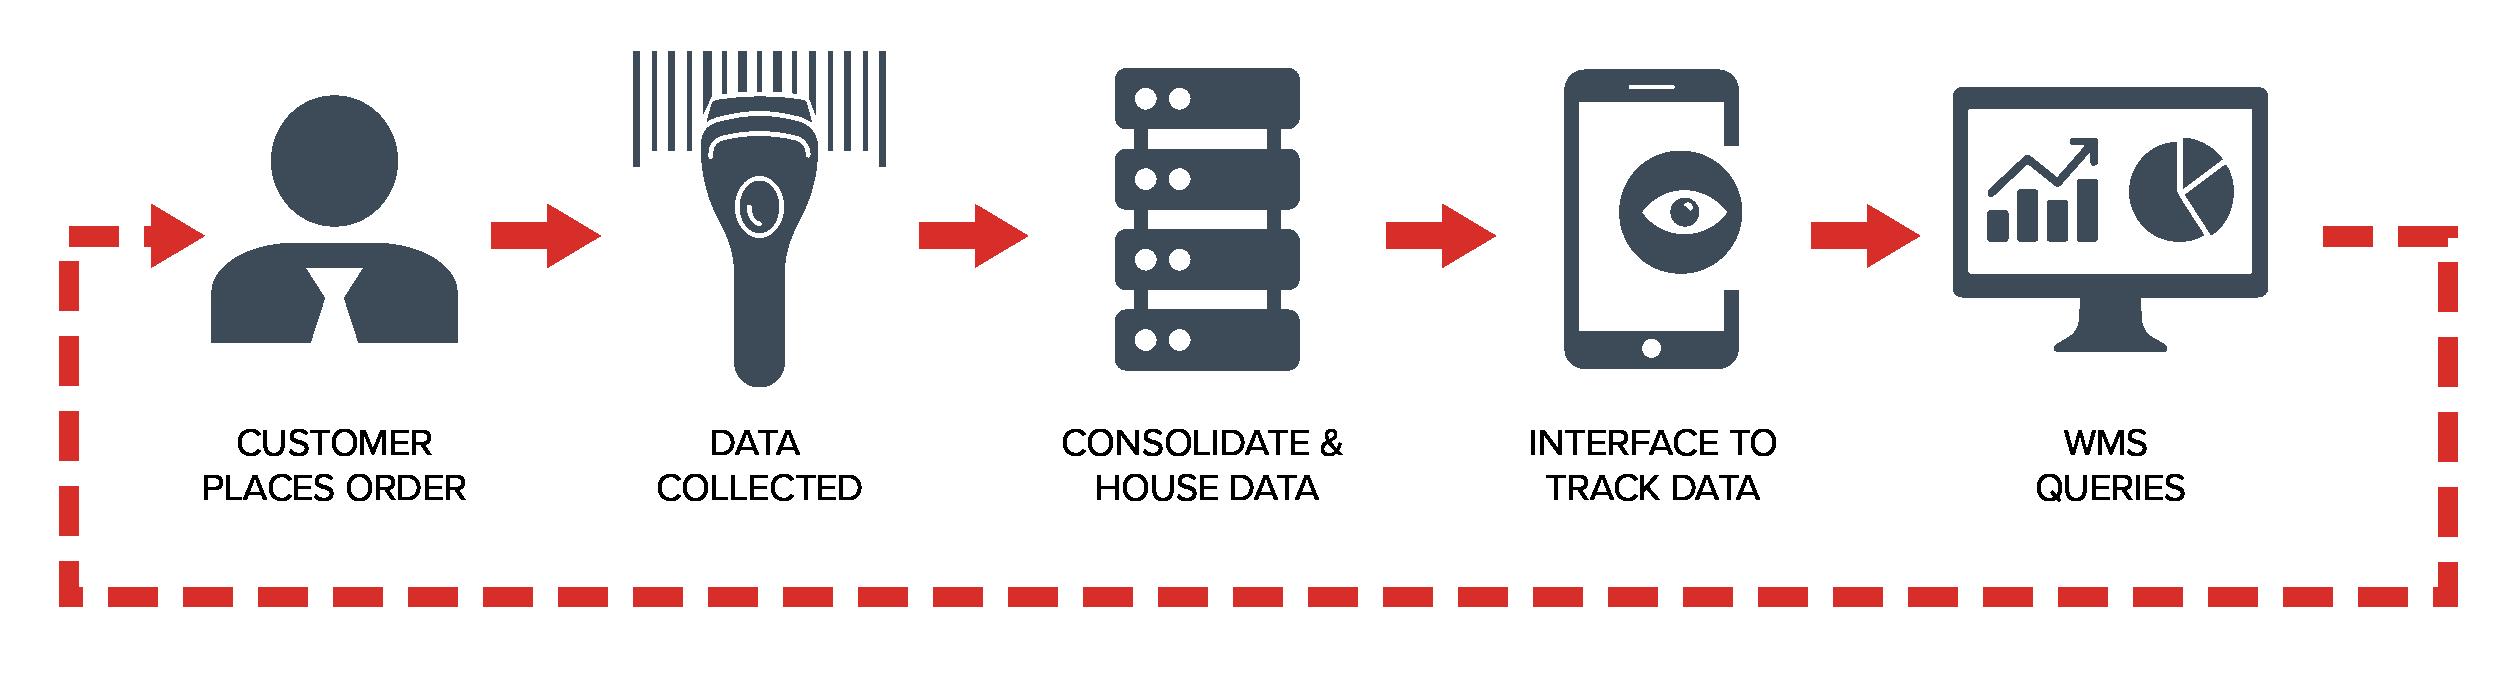 Kenco_AmazonEffect_r1_Blockchain